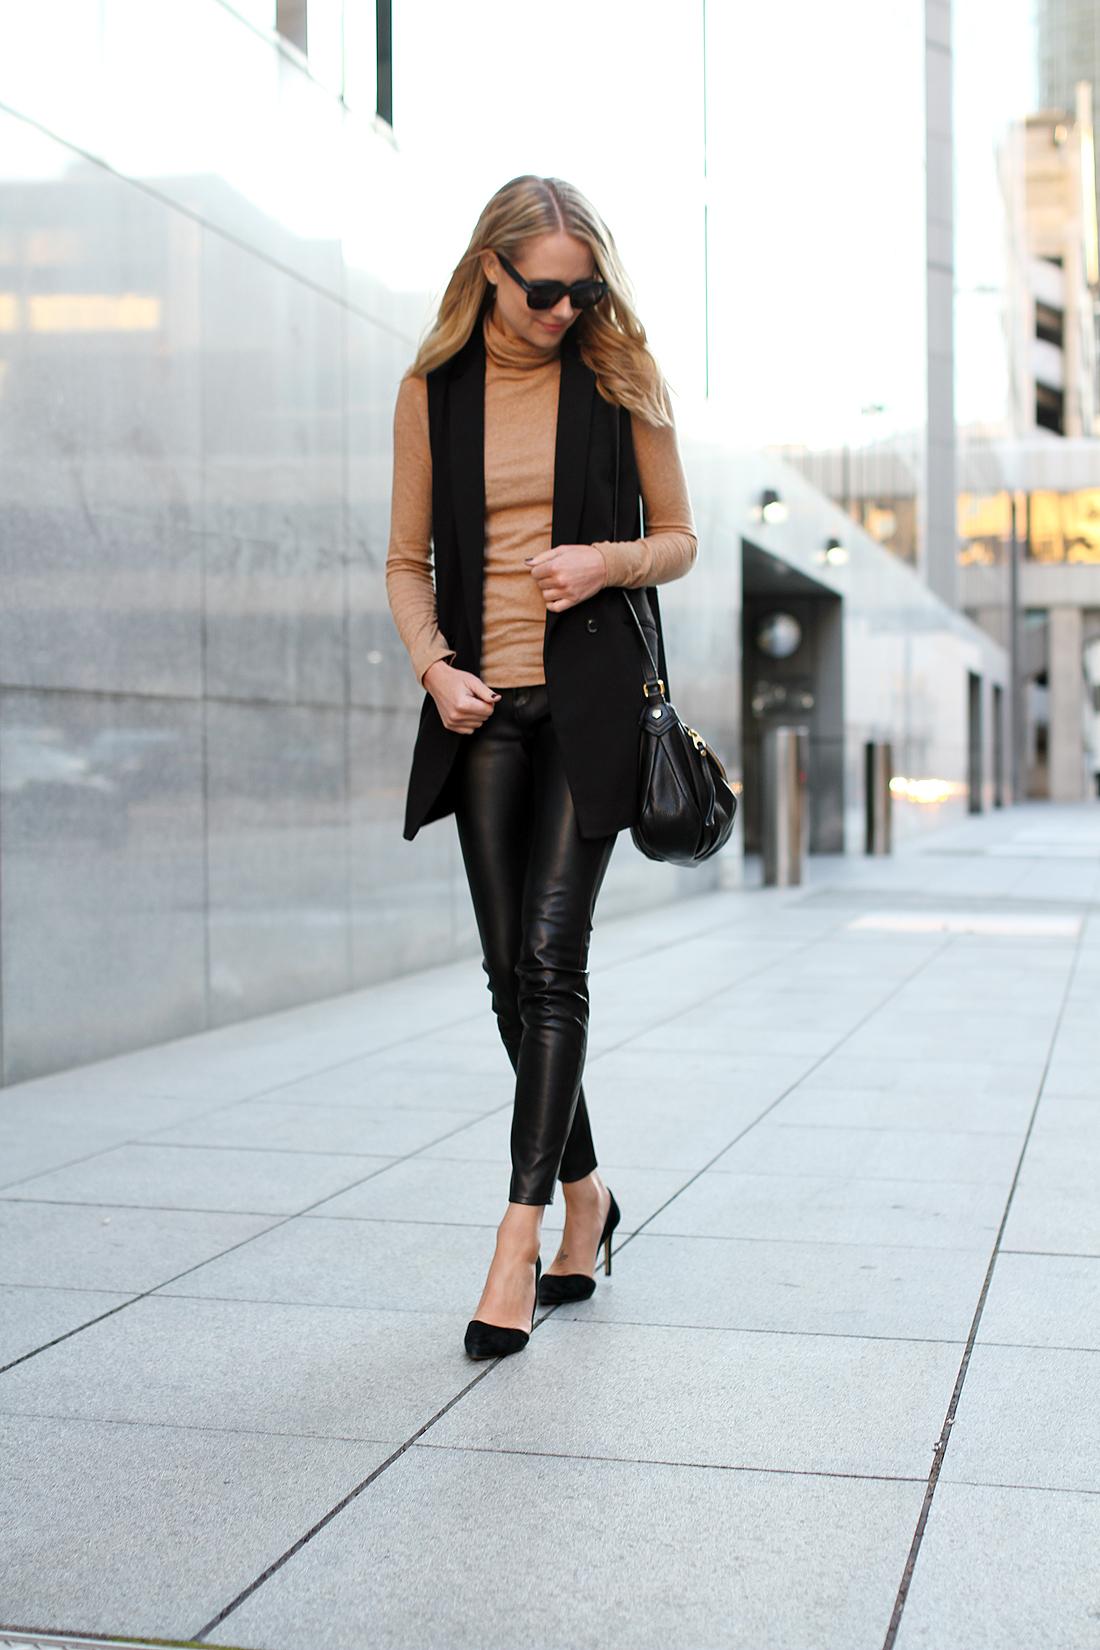 fashion-jackson-celine-sunglasses-camel-turtleneck-black-long-vest-black-faux-leather-skinny-pants-black-suede-pumps